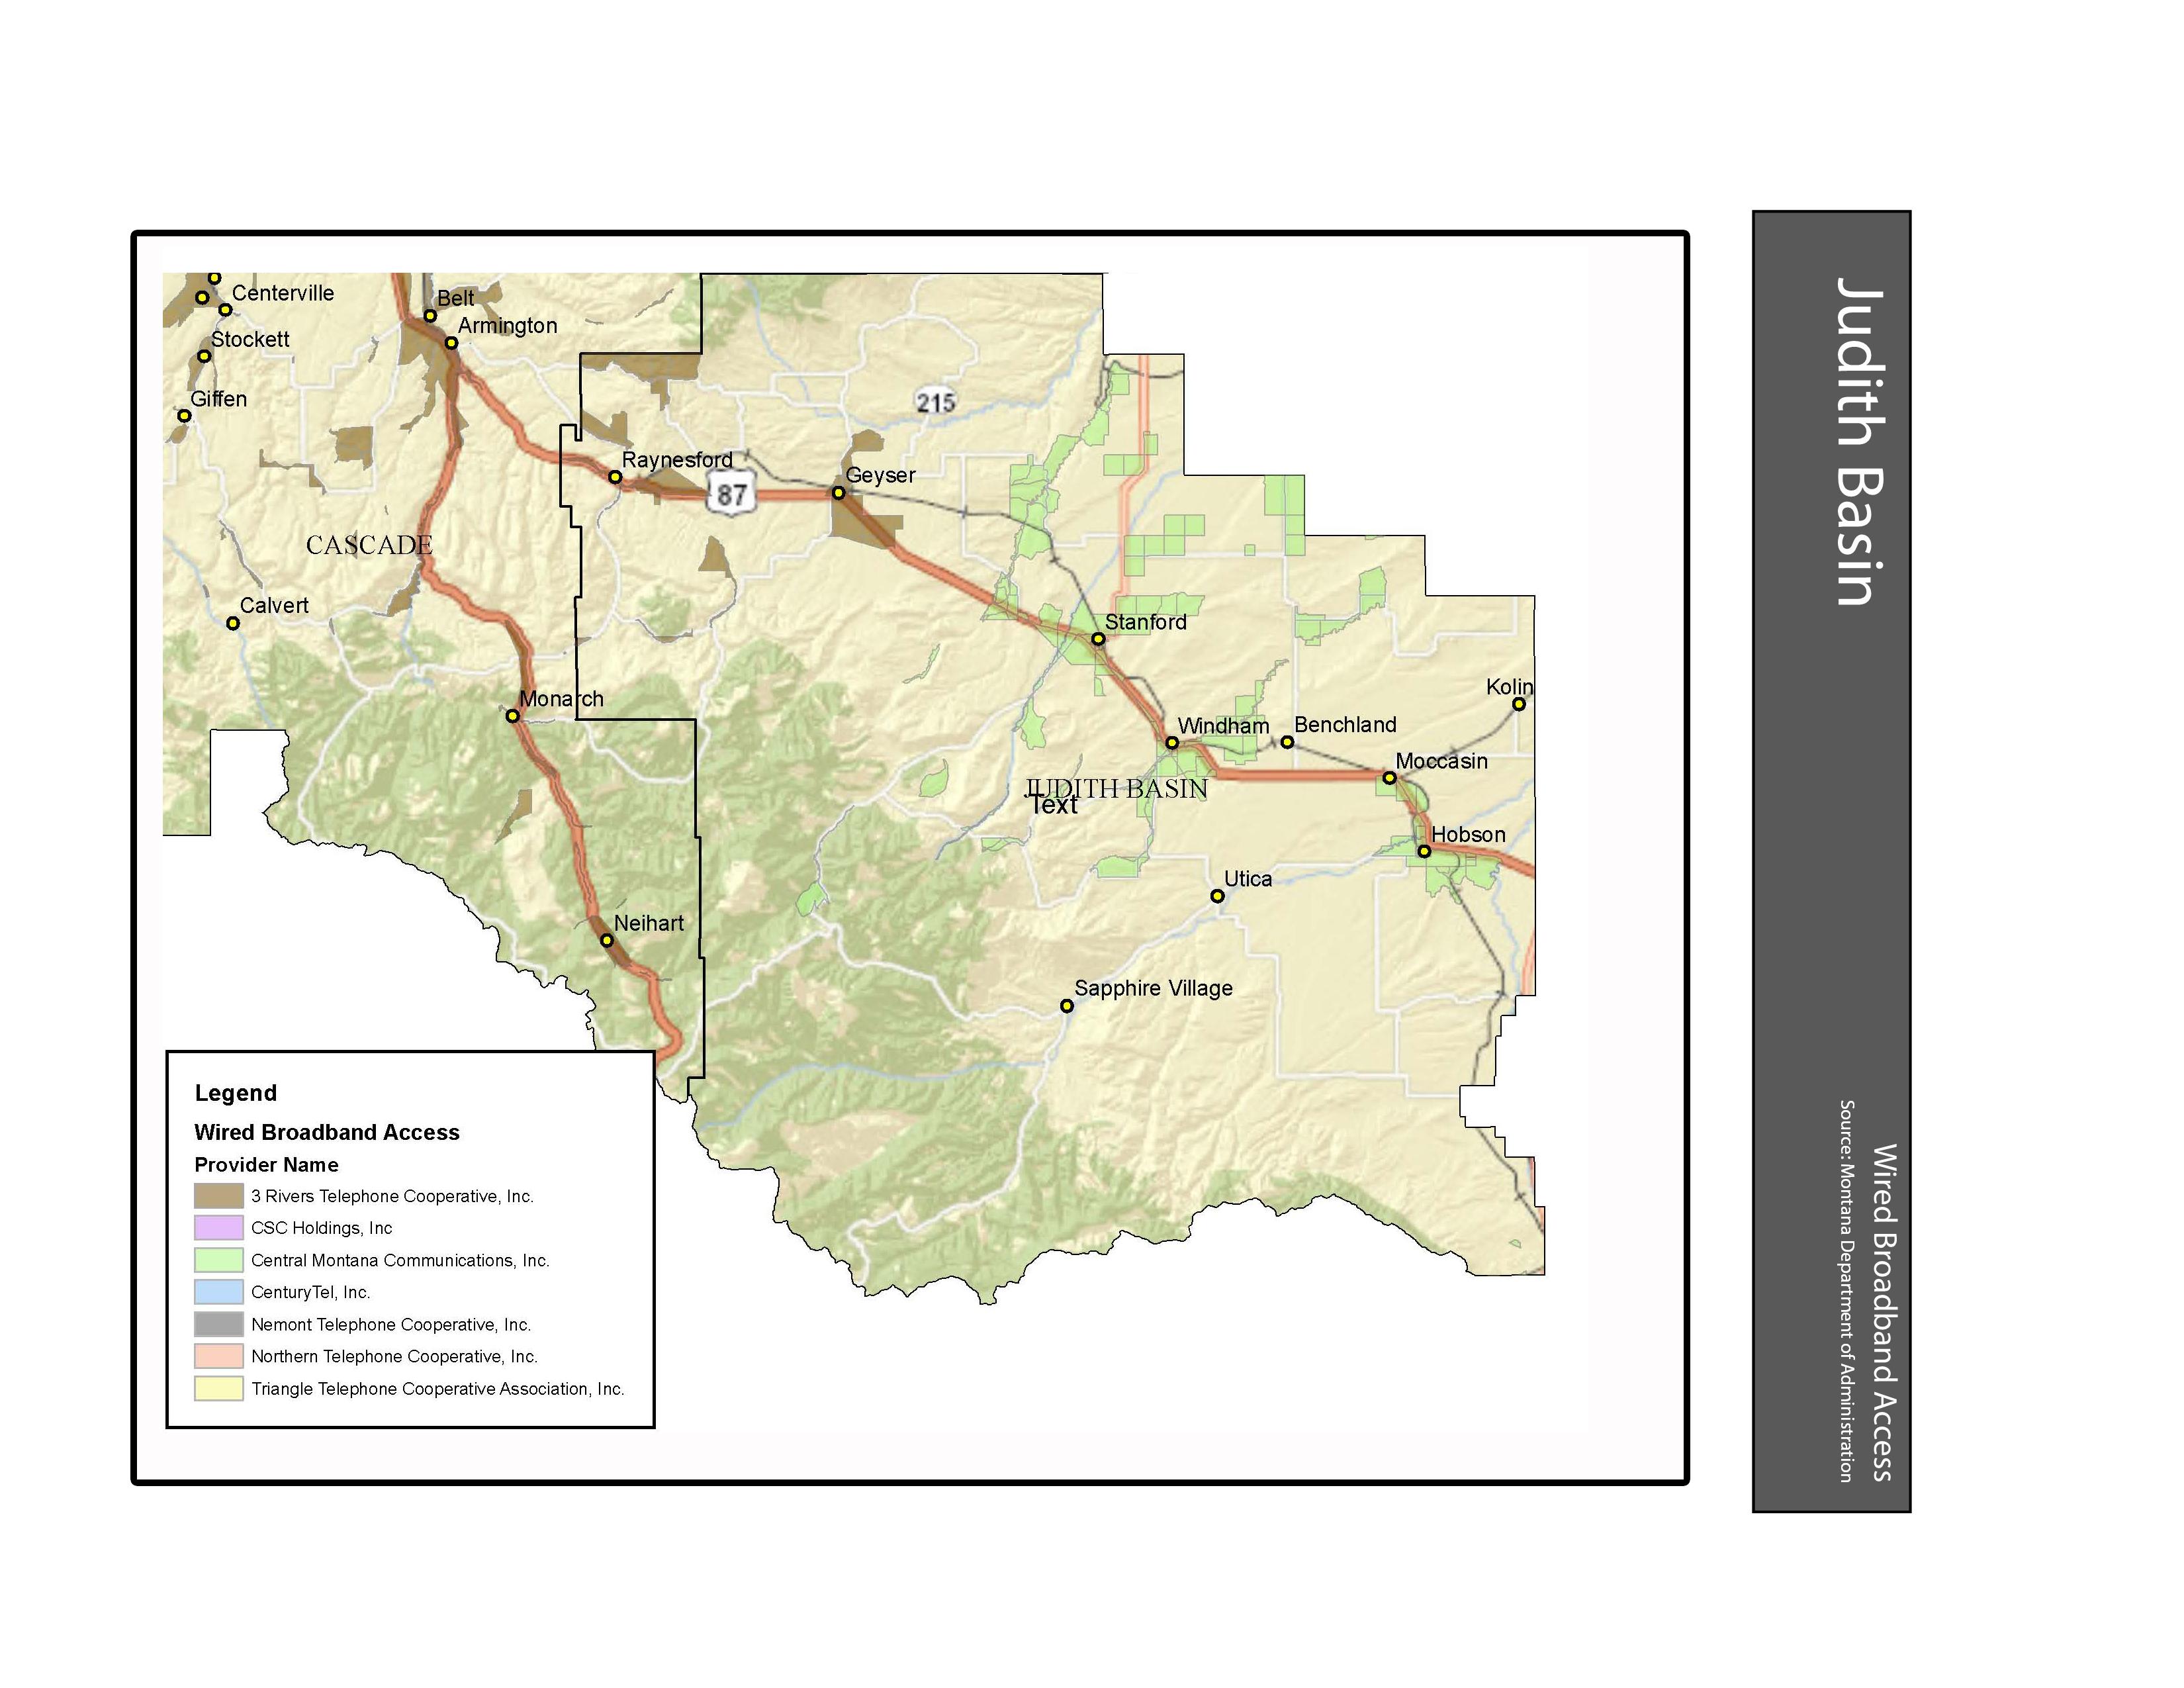 Wired Broadband Access Judith Basin County